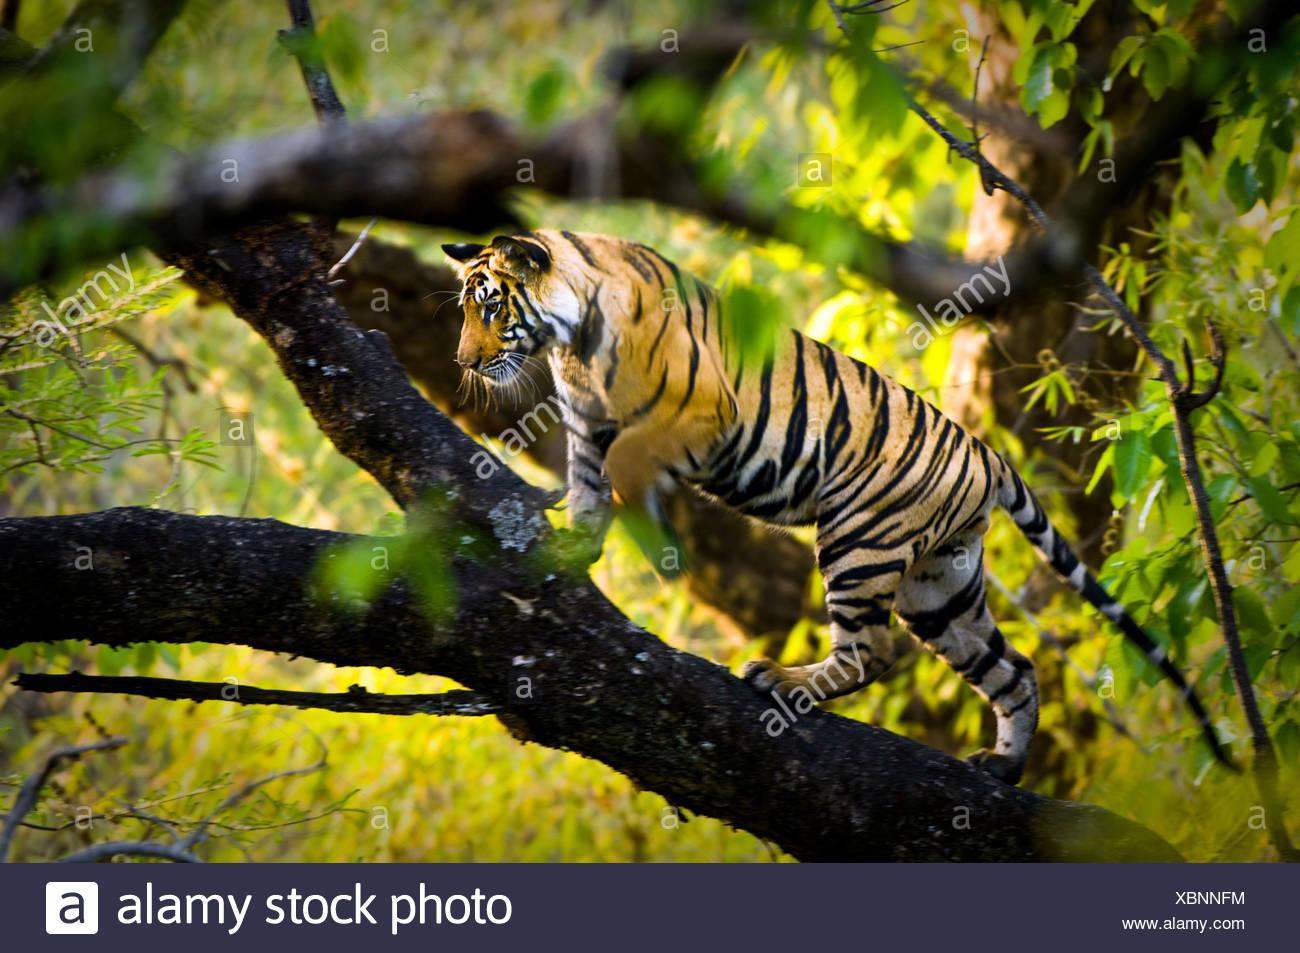 Adolescent male Bengal Tiger (around 15 months) climbing a tree. Bandhavgarh NP, Madhya Pradesh, India. - Stock Image